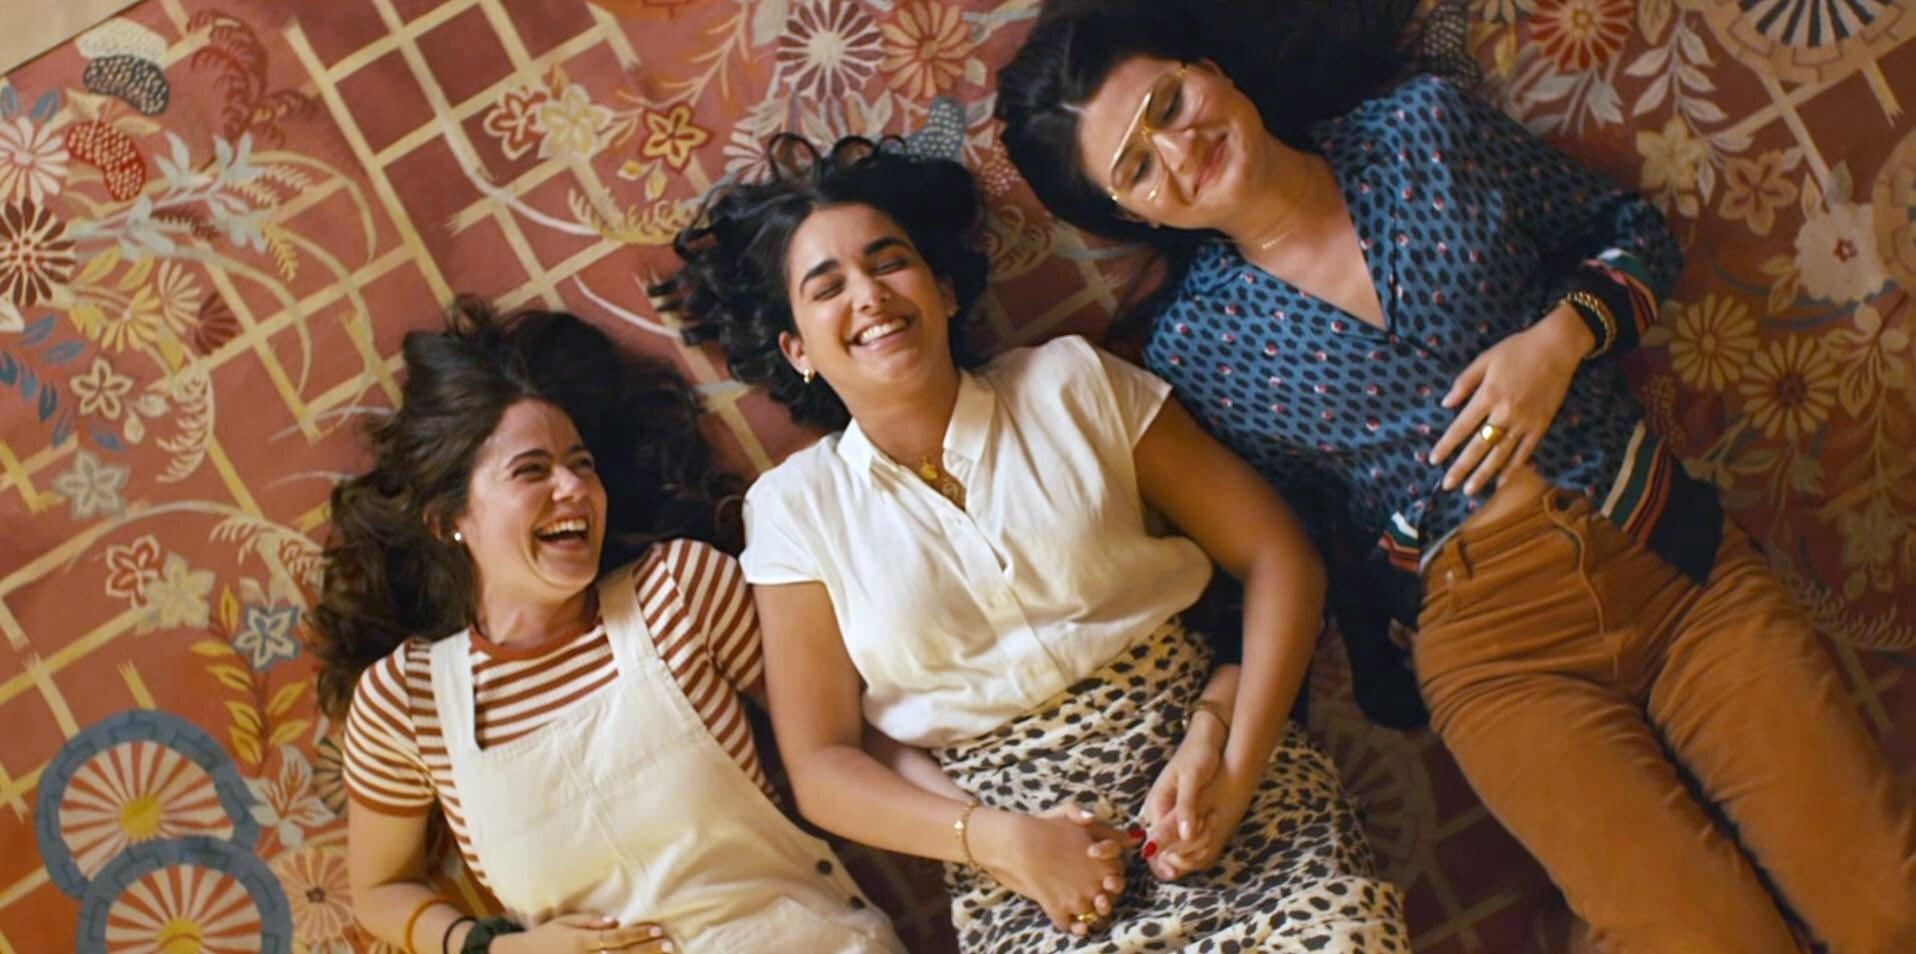 Molly Gordon, Geraldine Viswanathan, and Phillipa Soo laughing on the fllor